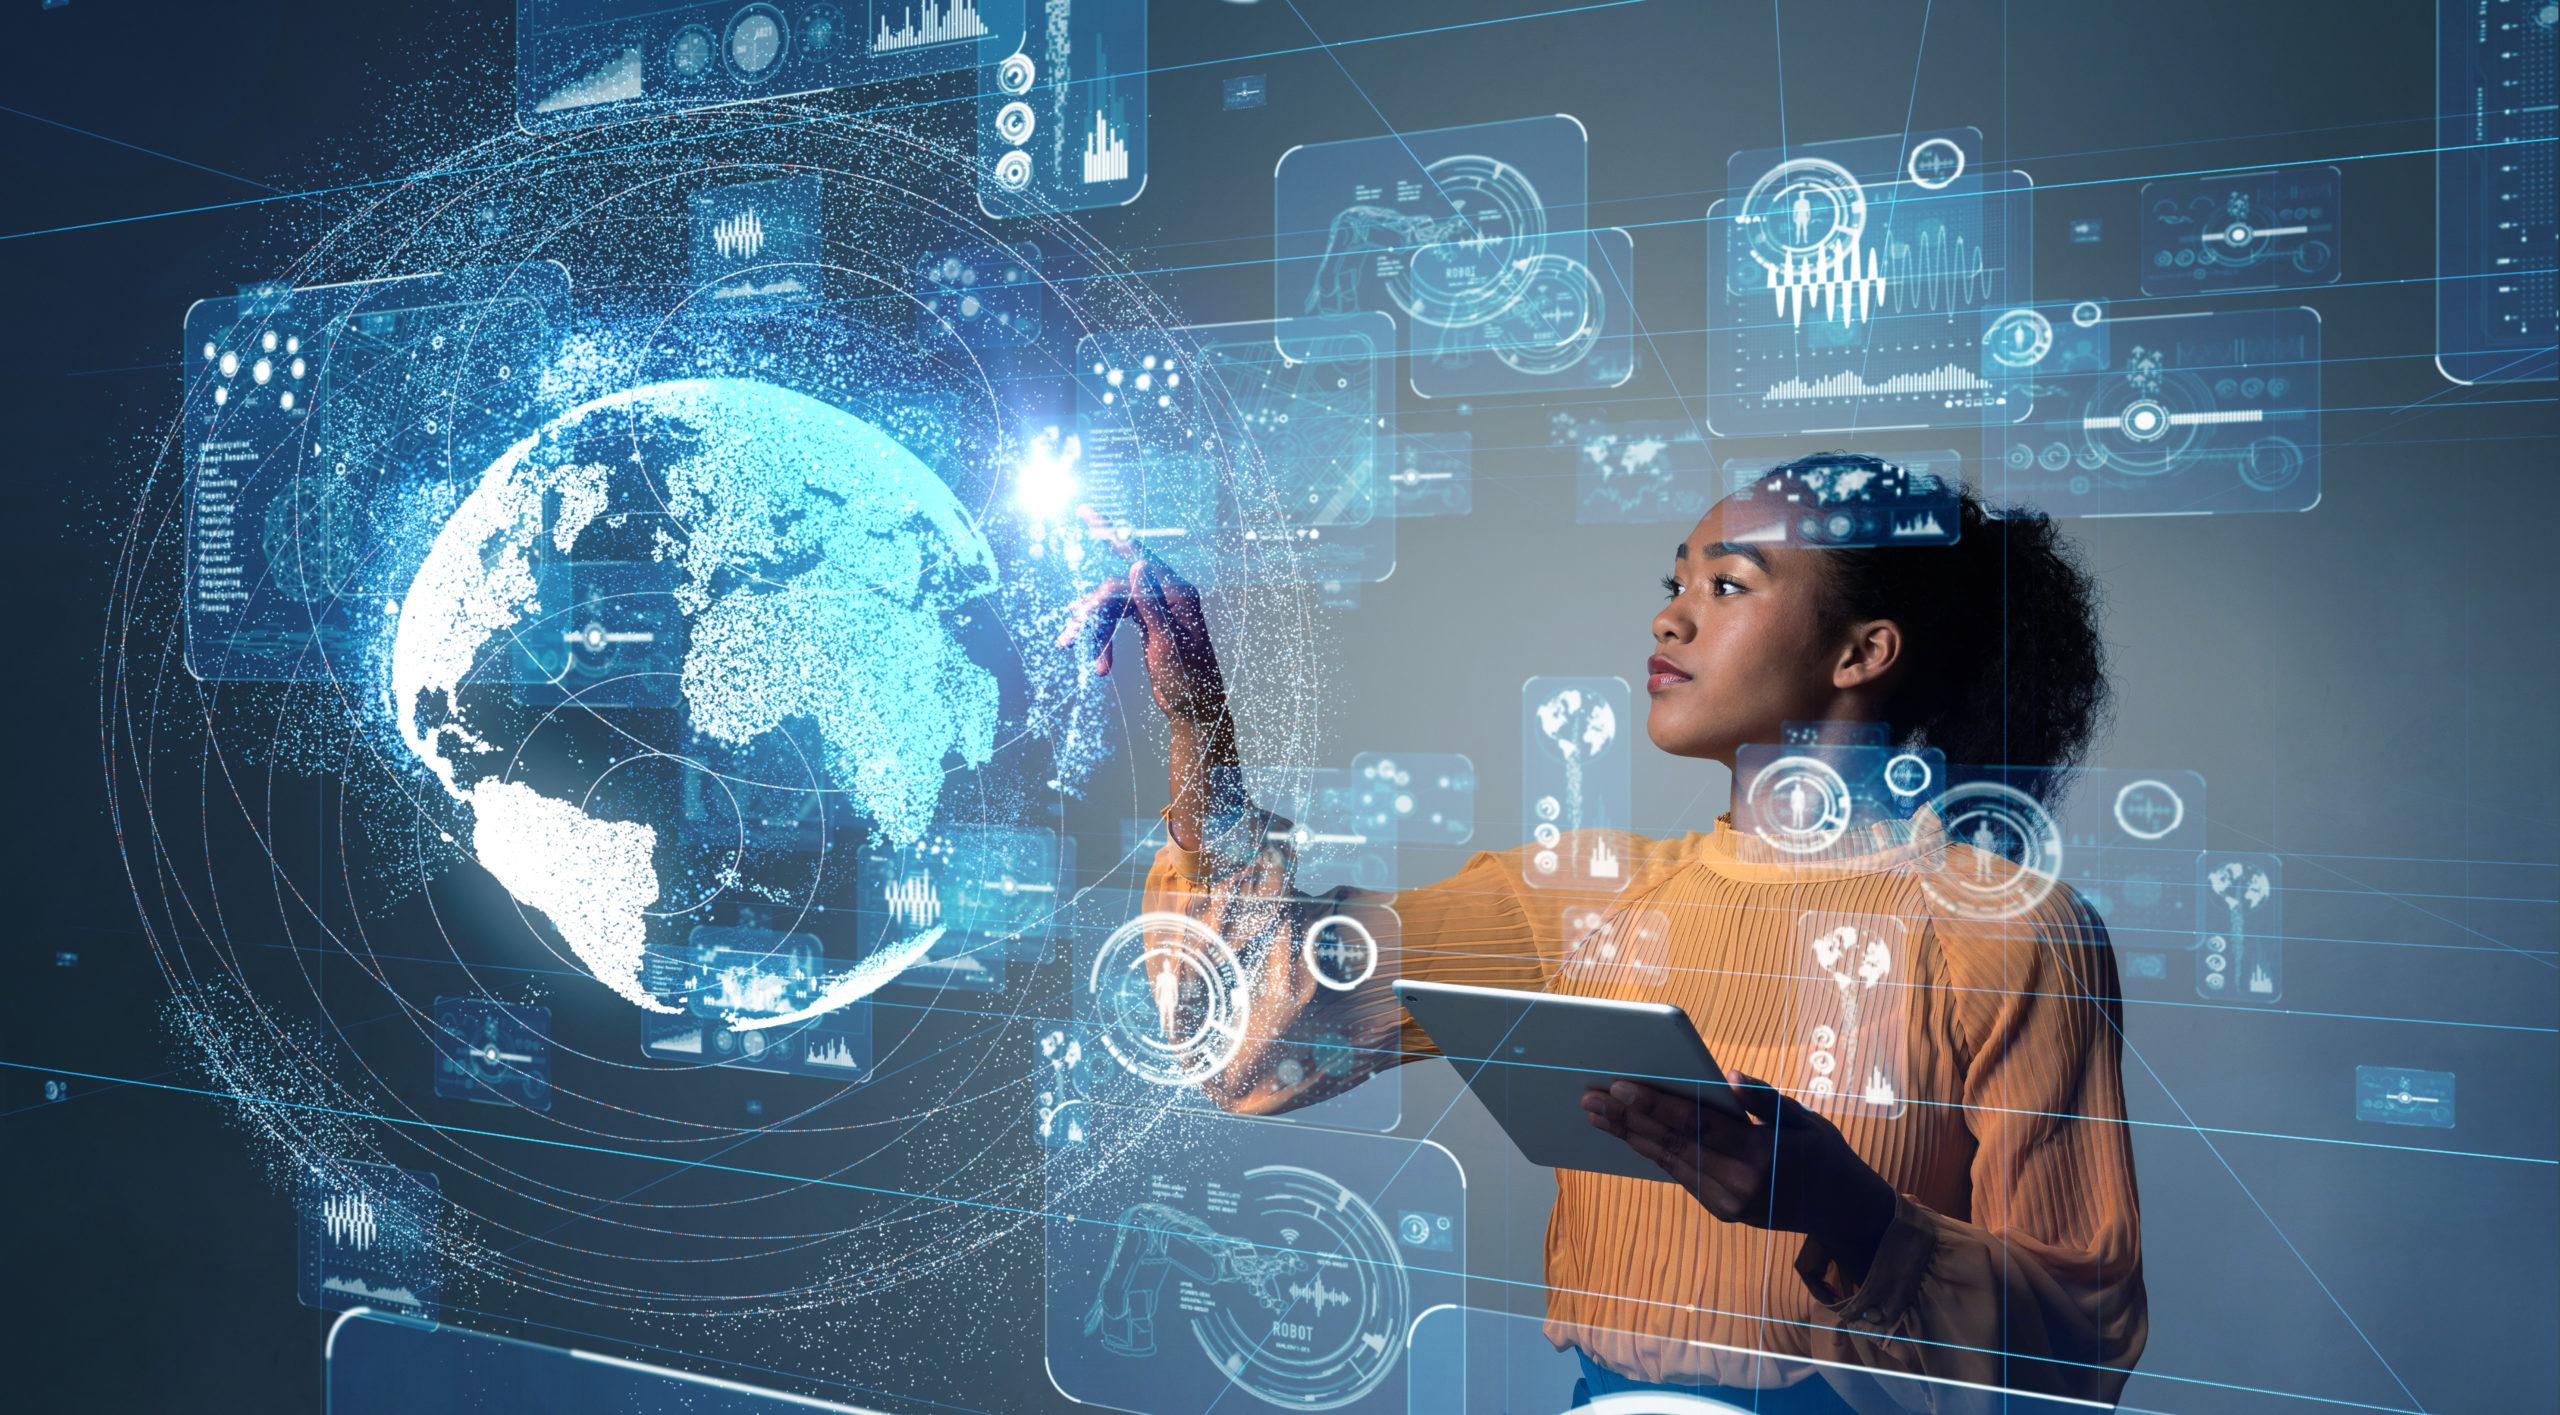 Key metrics to measure digital transformation